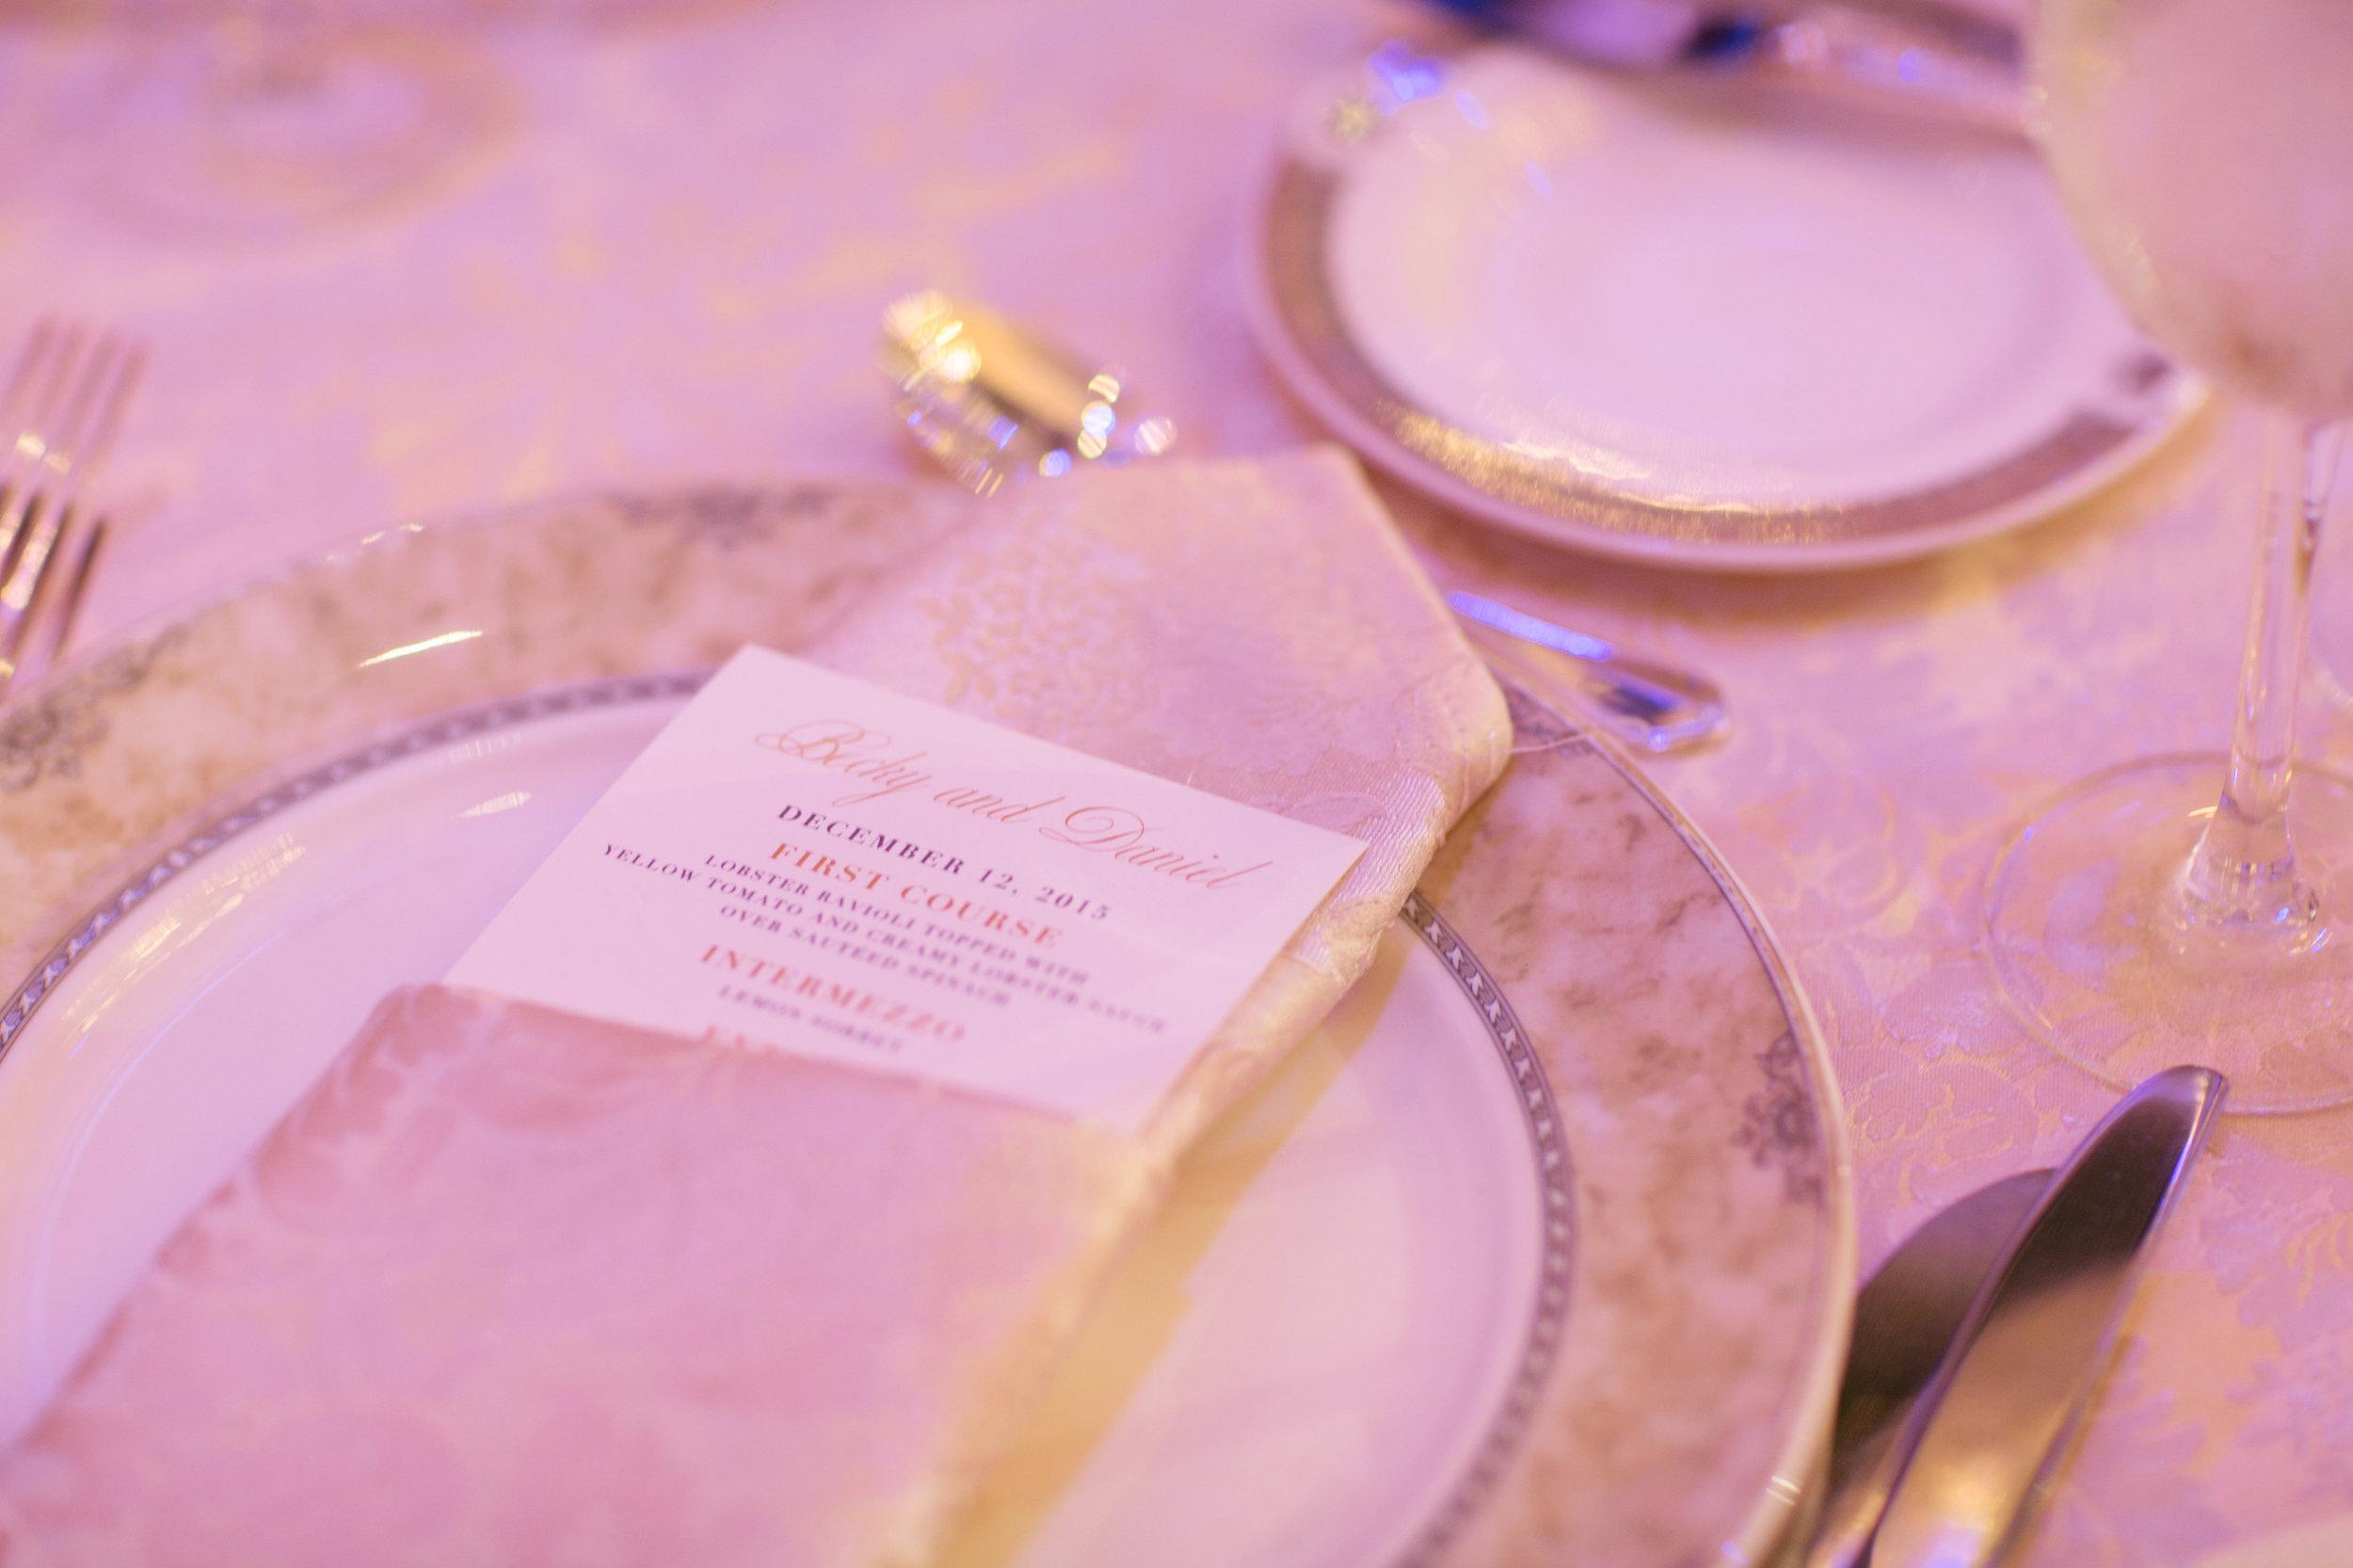 Ceci_New_York_Custom_Invitation_ New_Jersey_Wedding_Luxury_Personalized_Ceci_Style_Bride_Foil_Stamping51.jpg